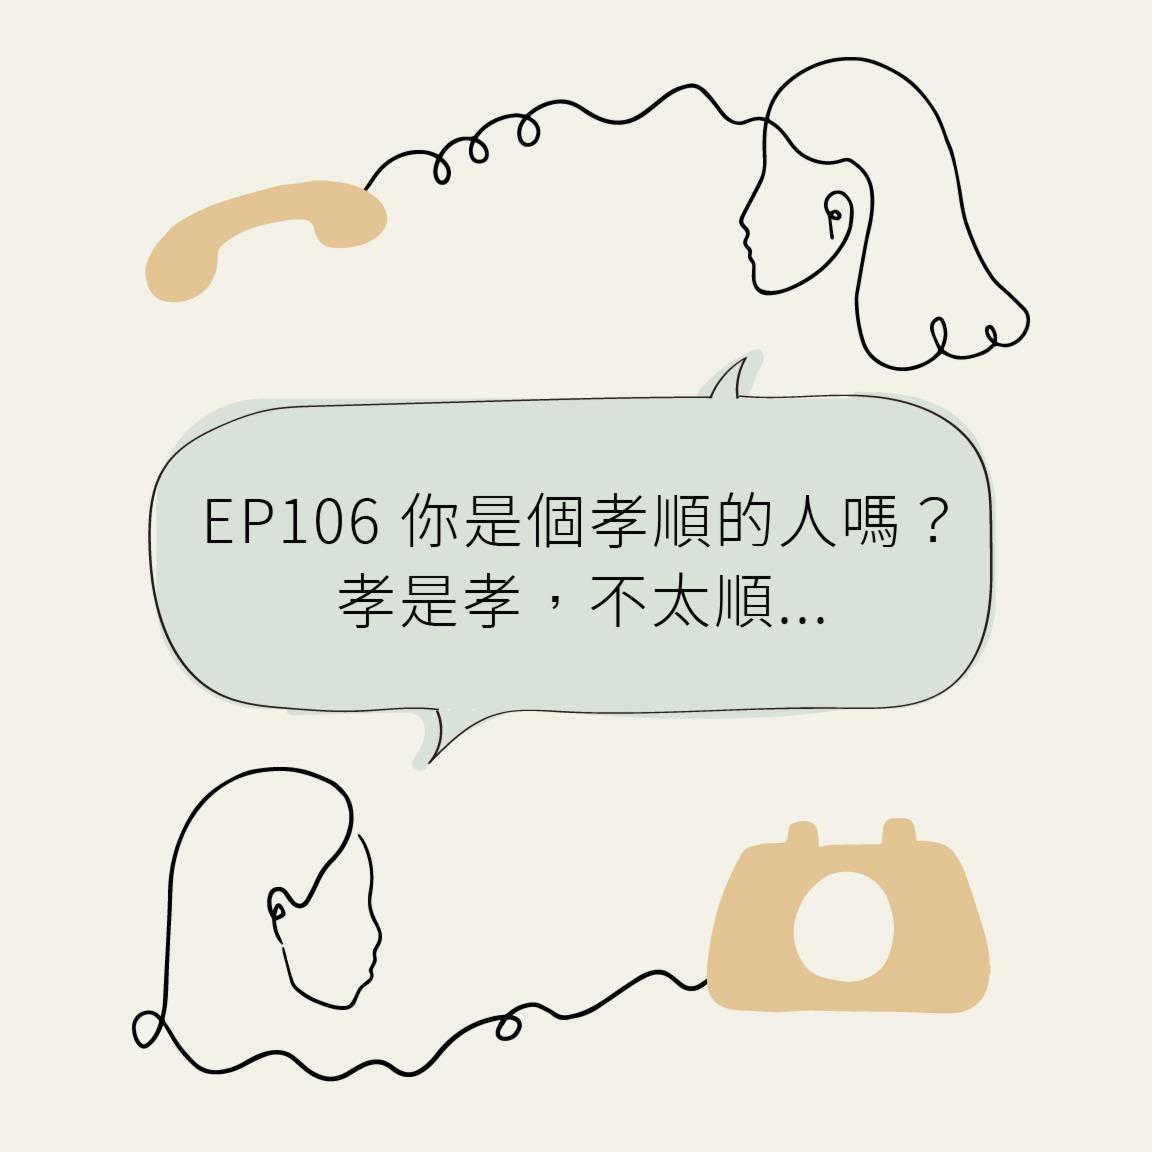 EP106 你是个孝顺的人吗?孝是孝,不太顺